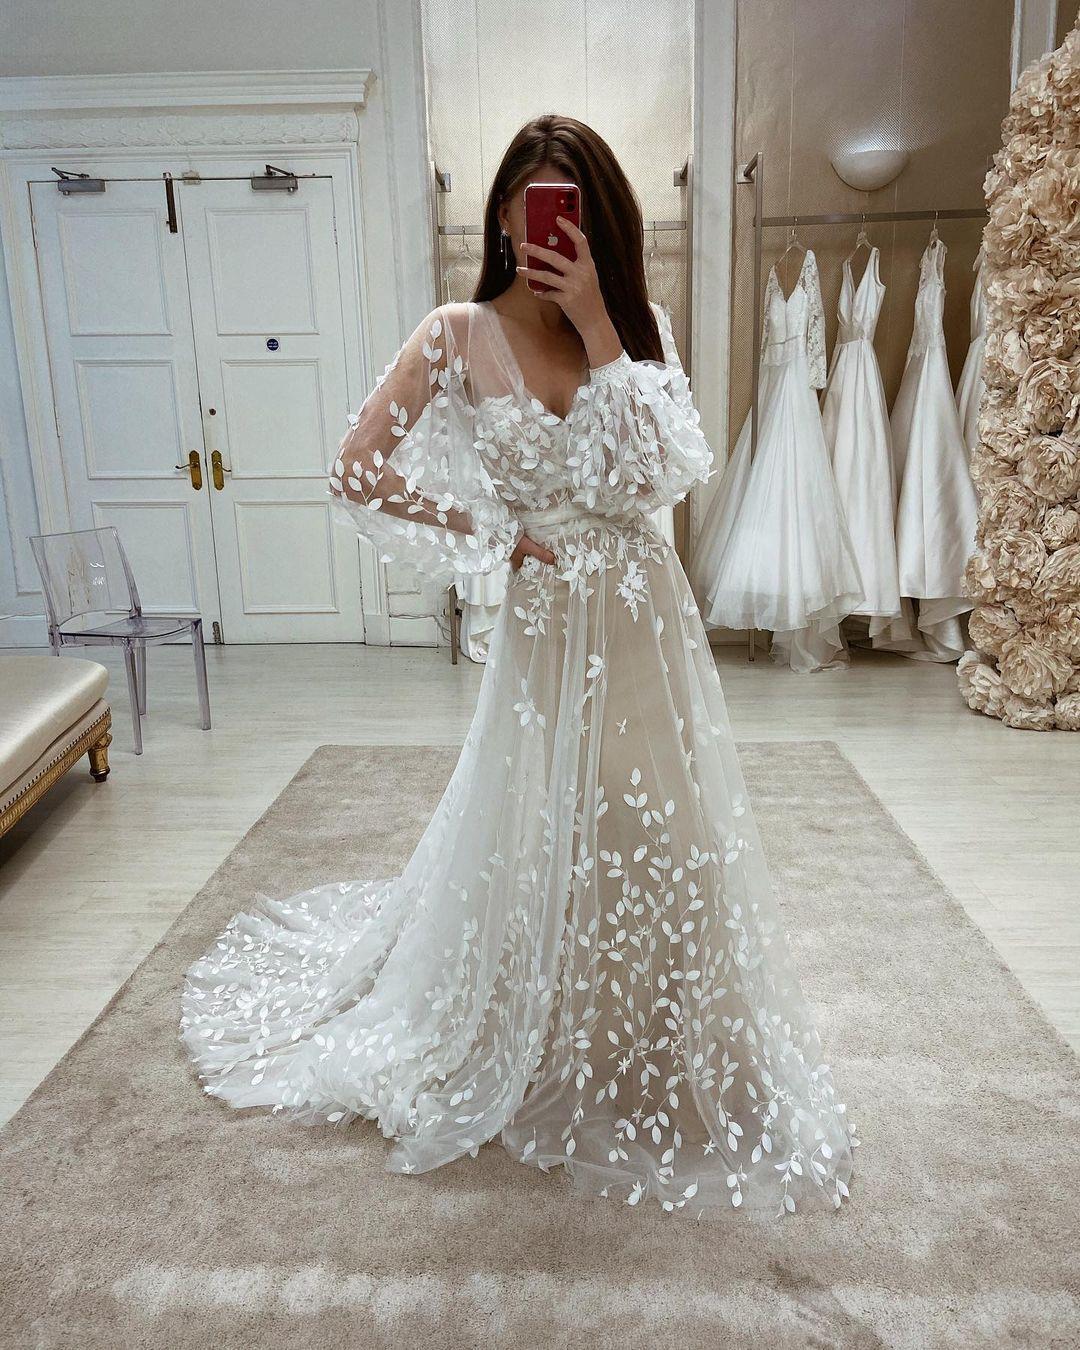 Eleganza Sposa Wedding Dresses 2021 In 2021 Modest Wedding Dresses With Sleeves Long Sleeve Wedding Gowns Wedding Gowns With Sleeves [ 1350 x 1080 Pixel ]